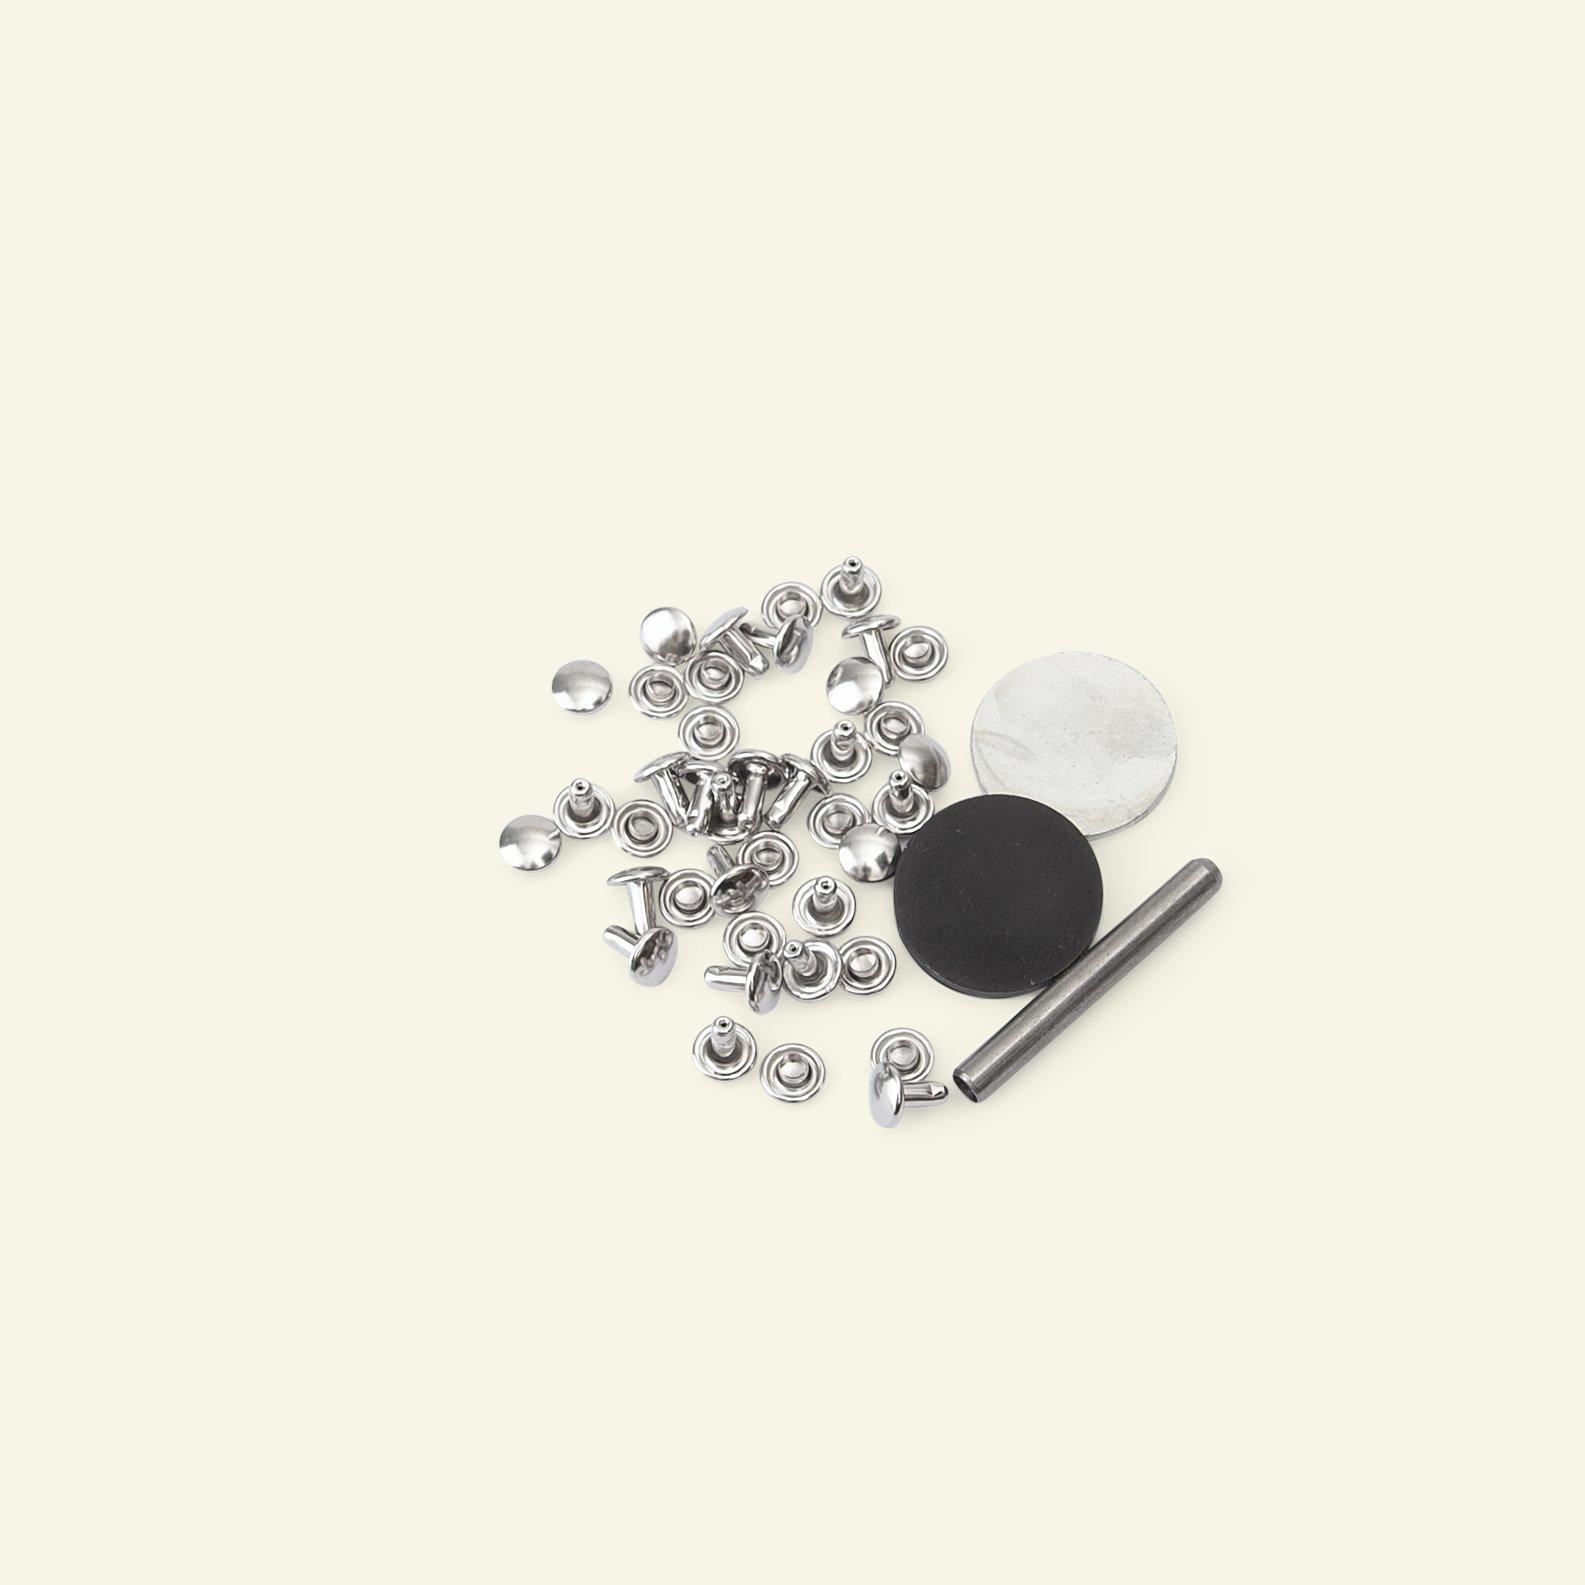 PRYM Tubular Rivets 3-4mm D. 7,5mm 20set 44903_pack